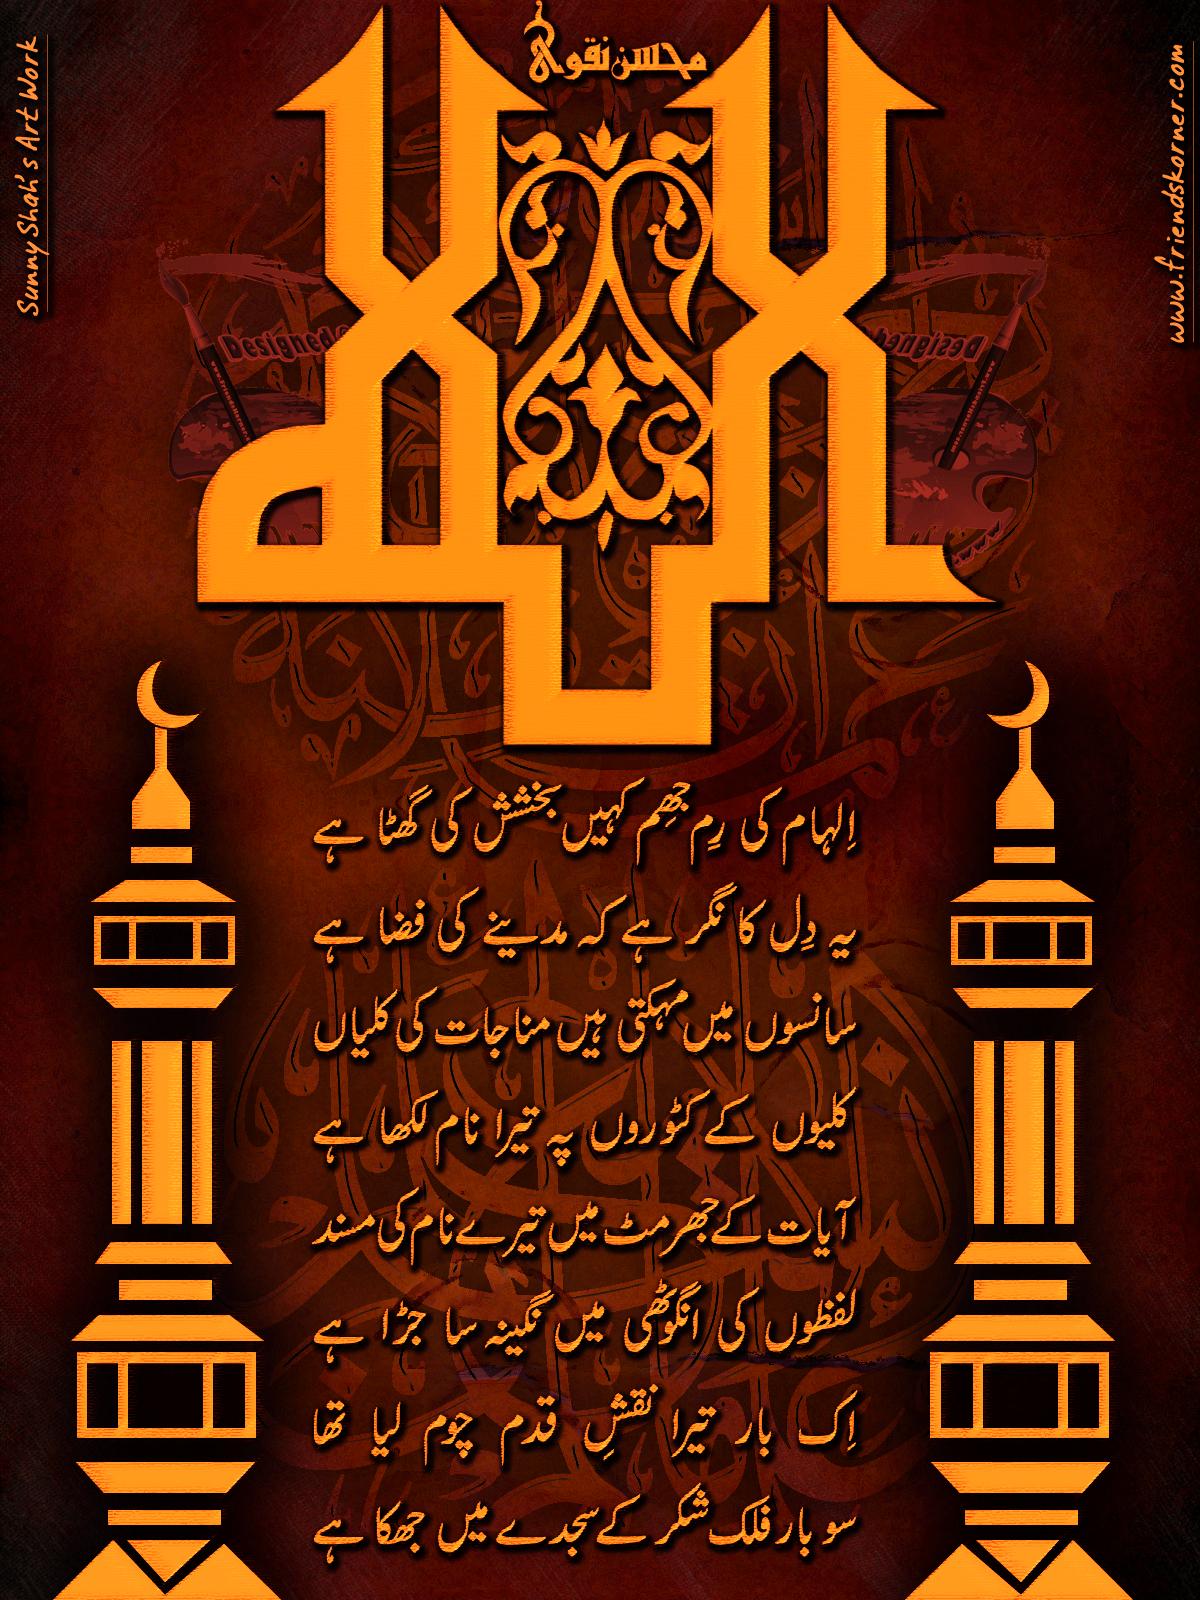 Islamic Books Free Download in Urdu & English, Urdu Novels